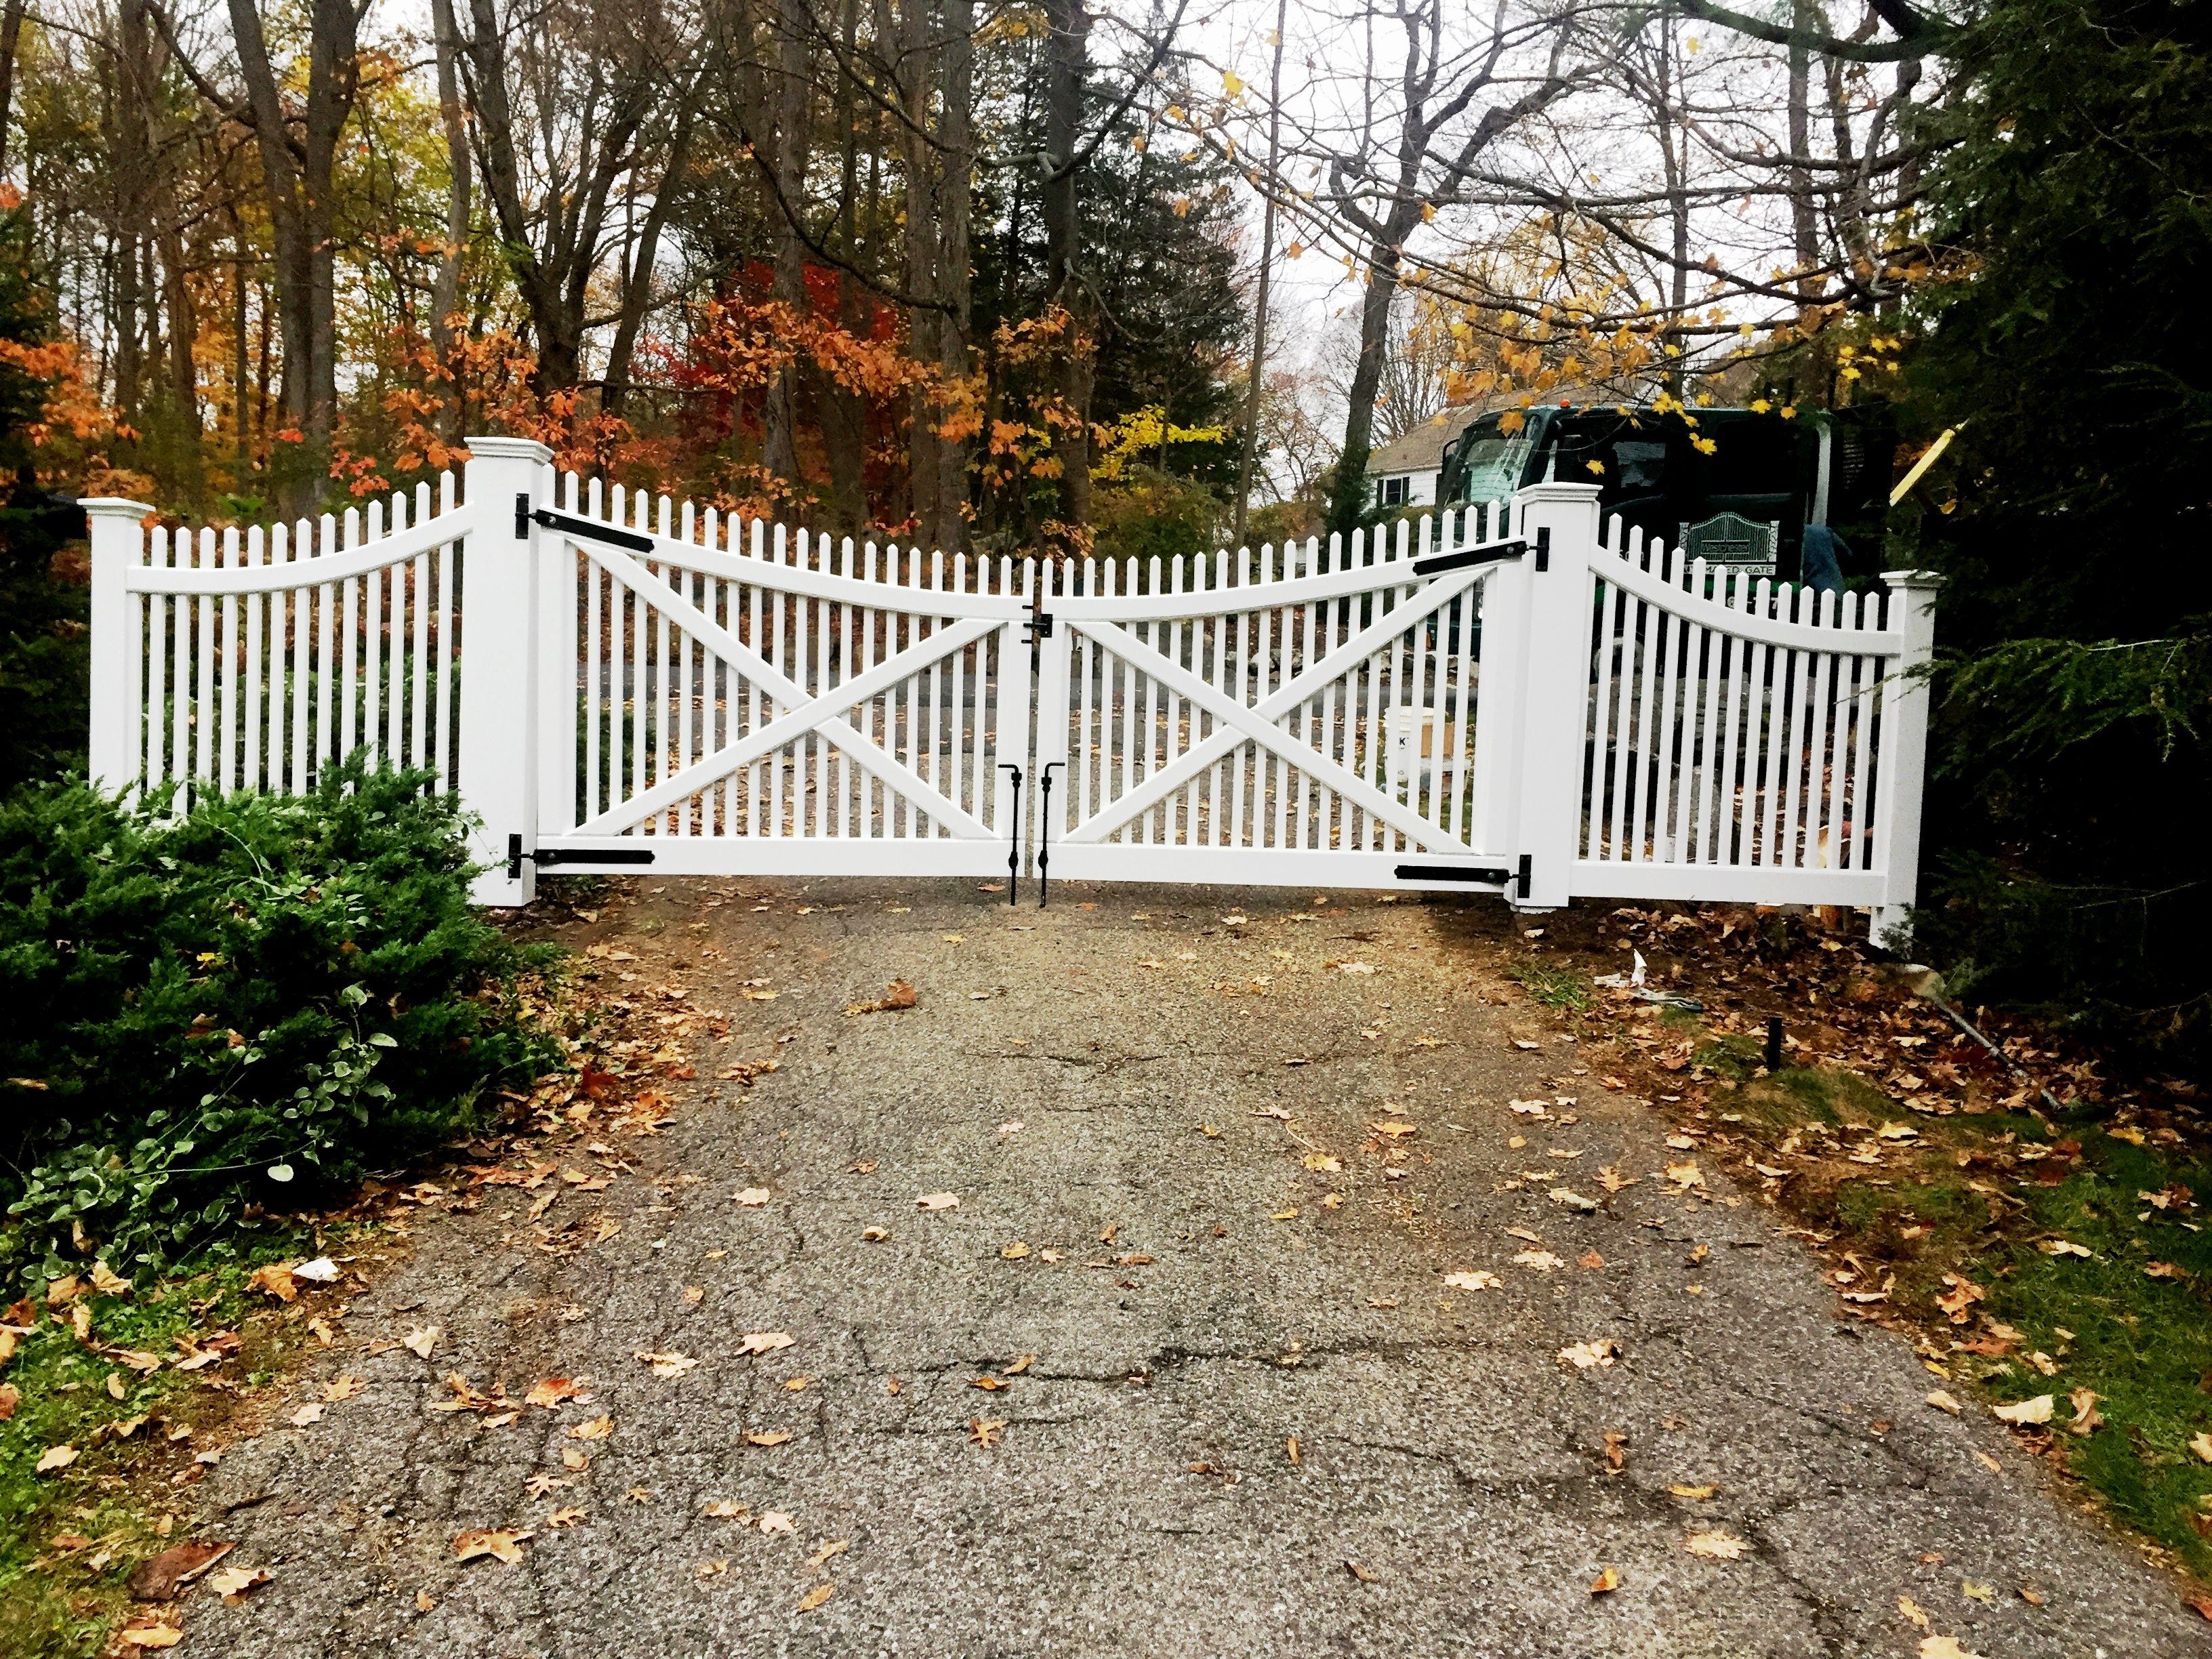 Scalloped Cedar Picket Driveway Gates Driveway Gate Driveway Picket Fence Gate